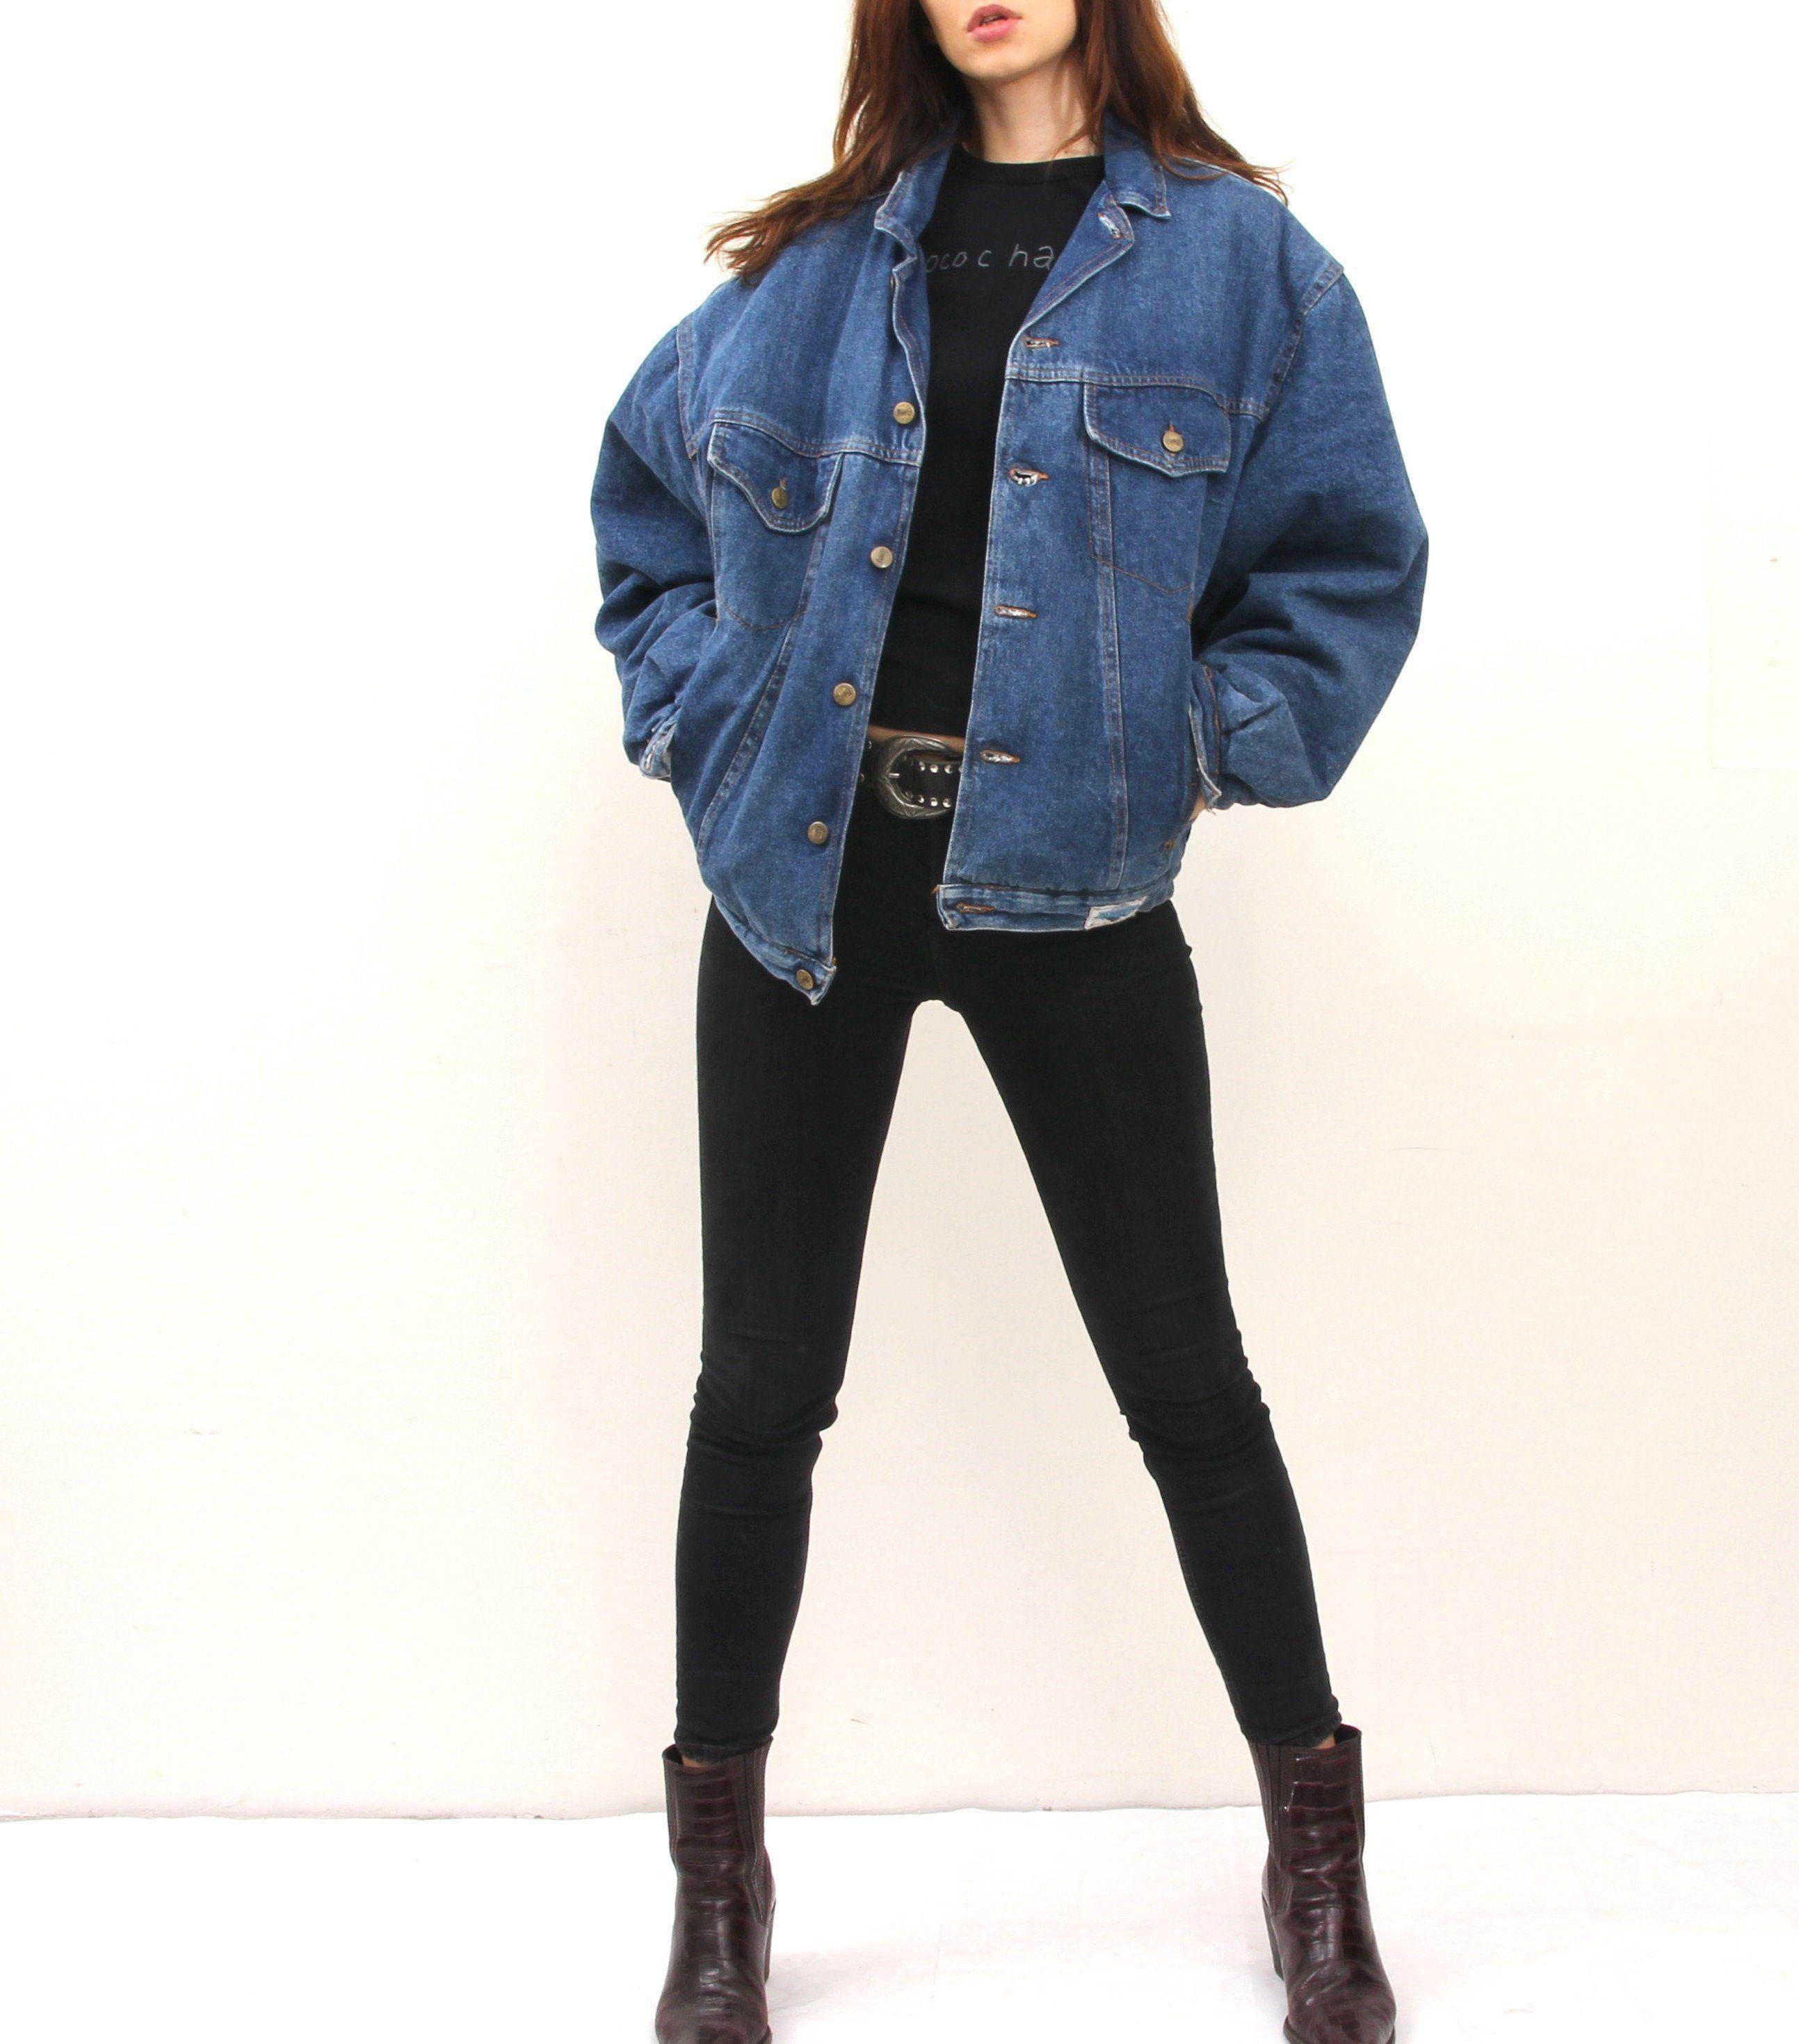 Warmed Denim Jacket Plaid Lined Jean Jacket Large Oversized Jeans Jacket L Oversized Denim Jacket Outfit Jacket Outfit Women Jacket Outfits [ 2940 x 2587 Pixel ]